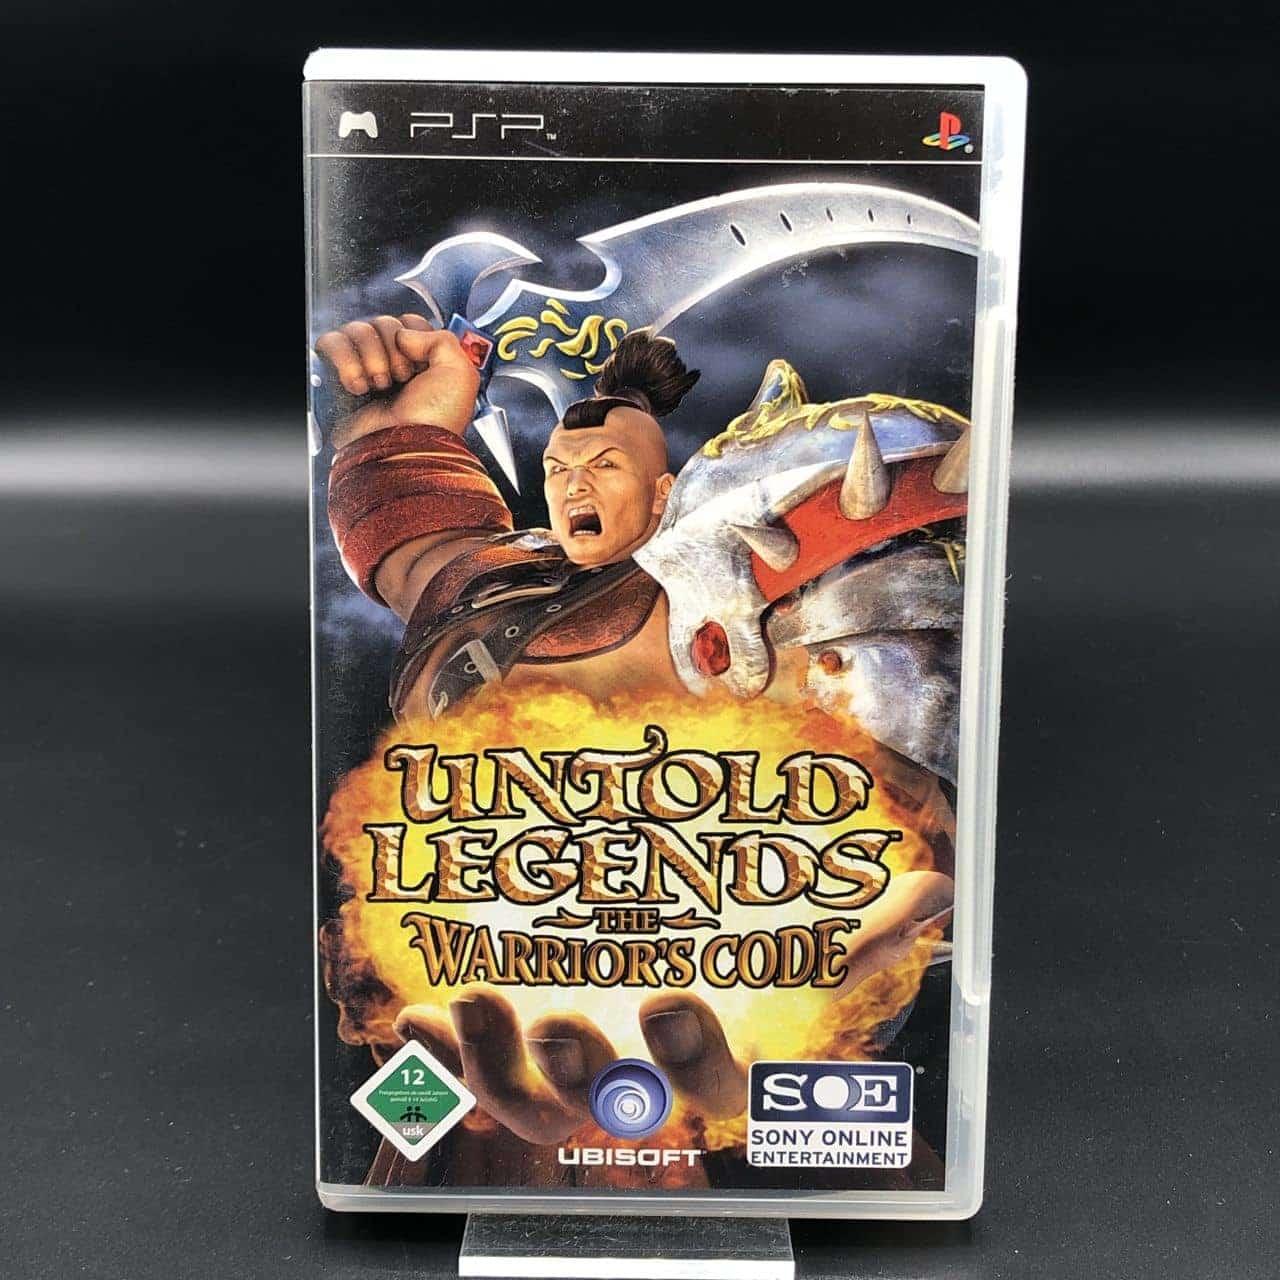 PSP Untold Legends: The Warriors Code (Komplett) (Sehr gut) Sony PlayStation Portable